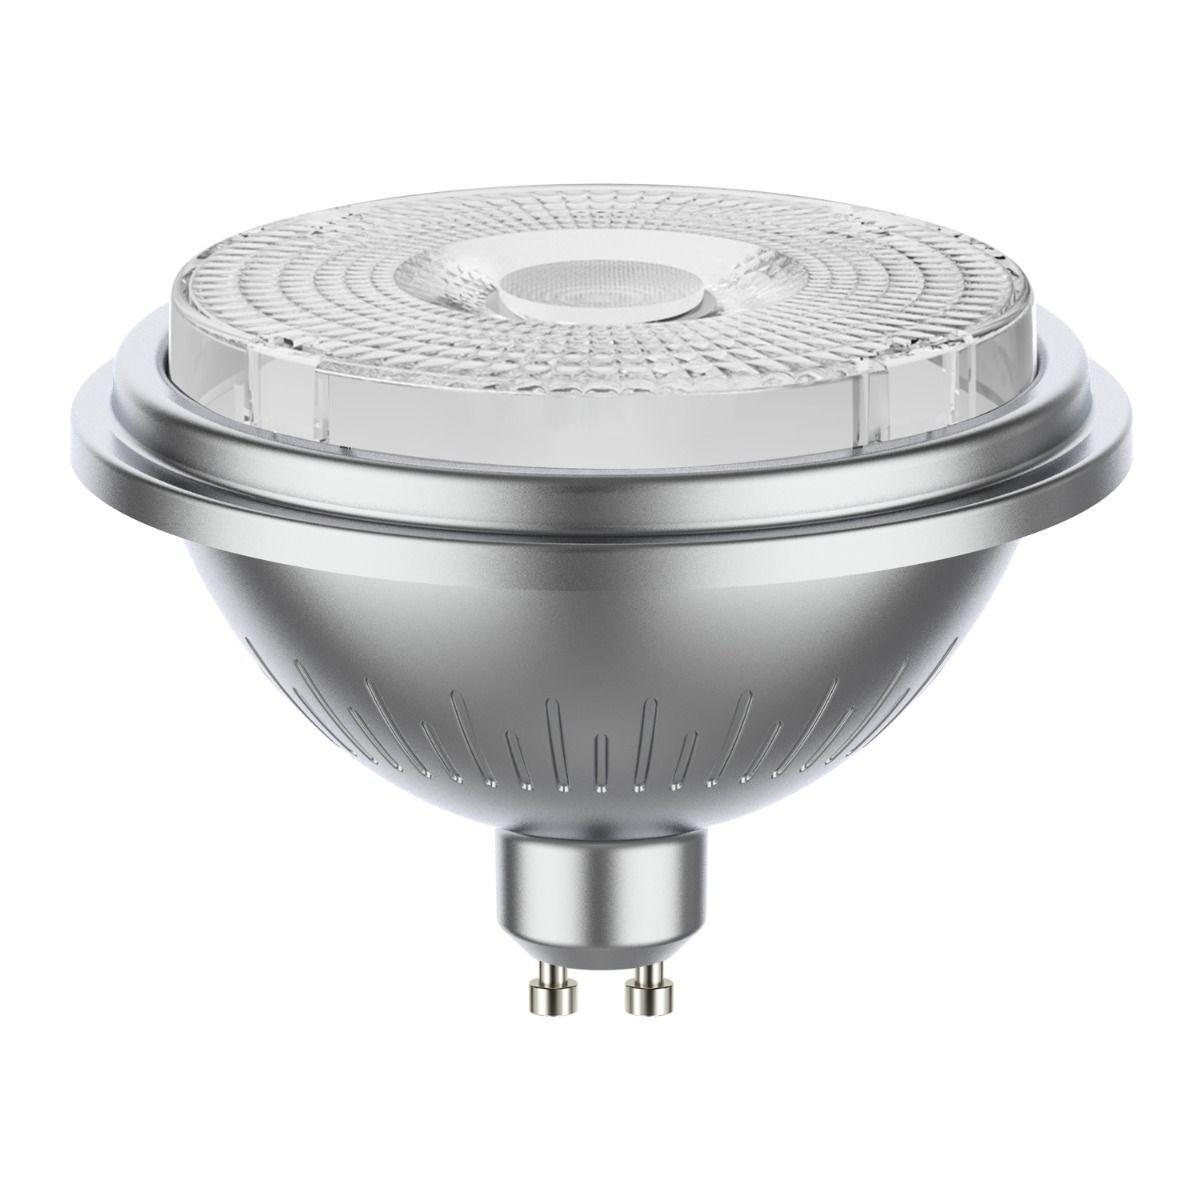 Noxion LEDspot AR111 GU10 11.5W 927 40D 880lm | Dimmbar - Extra Warmweiß - Ersatz für 75W